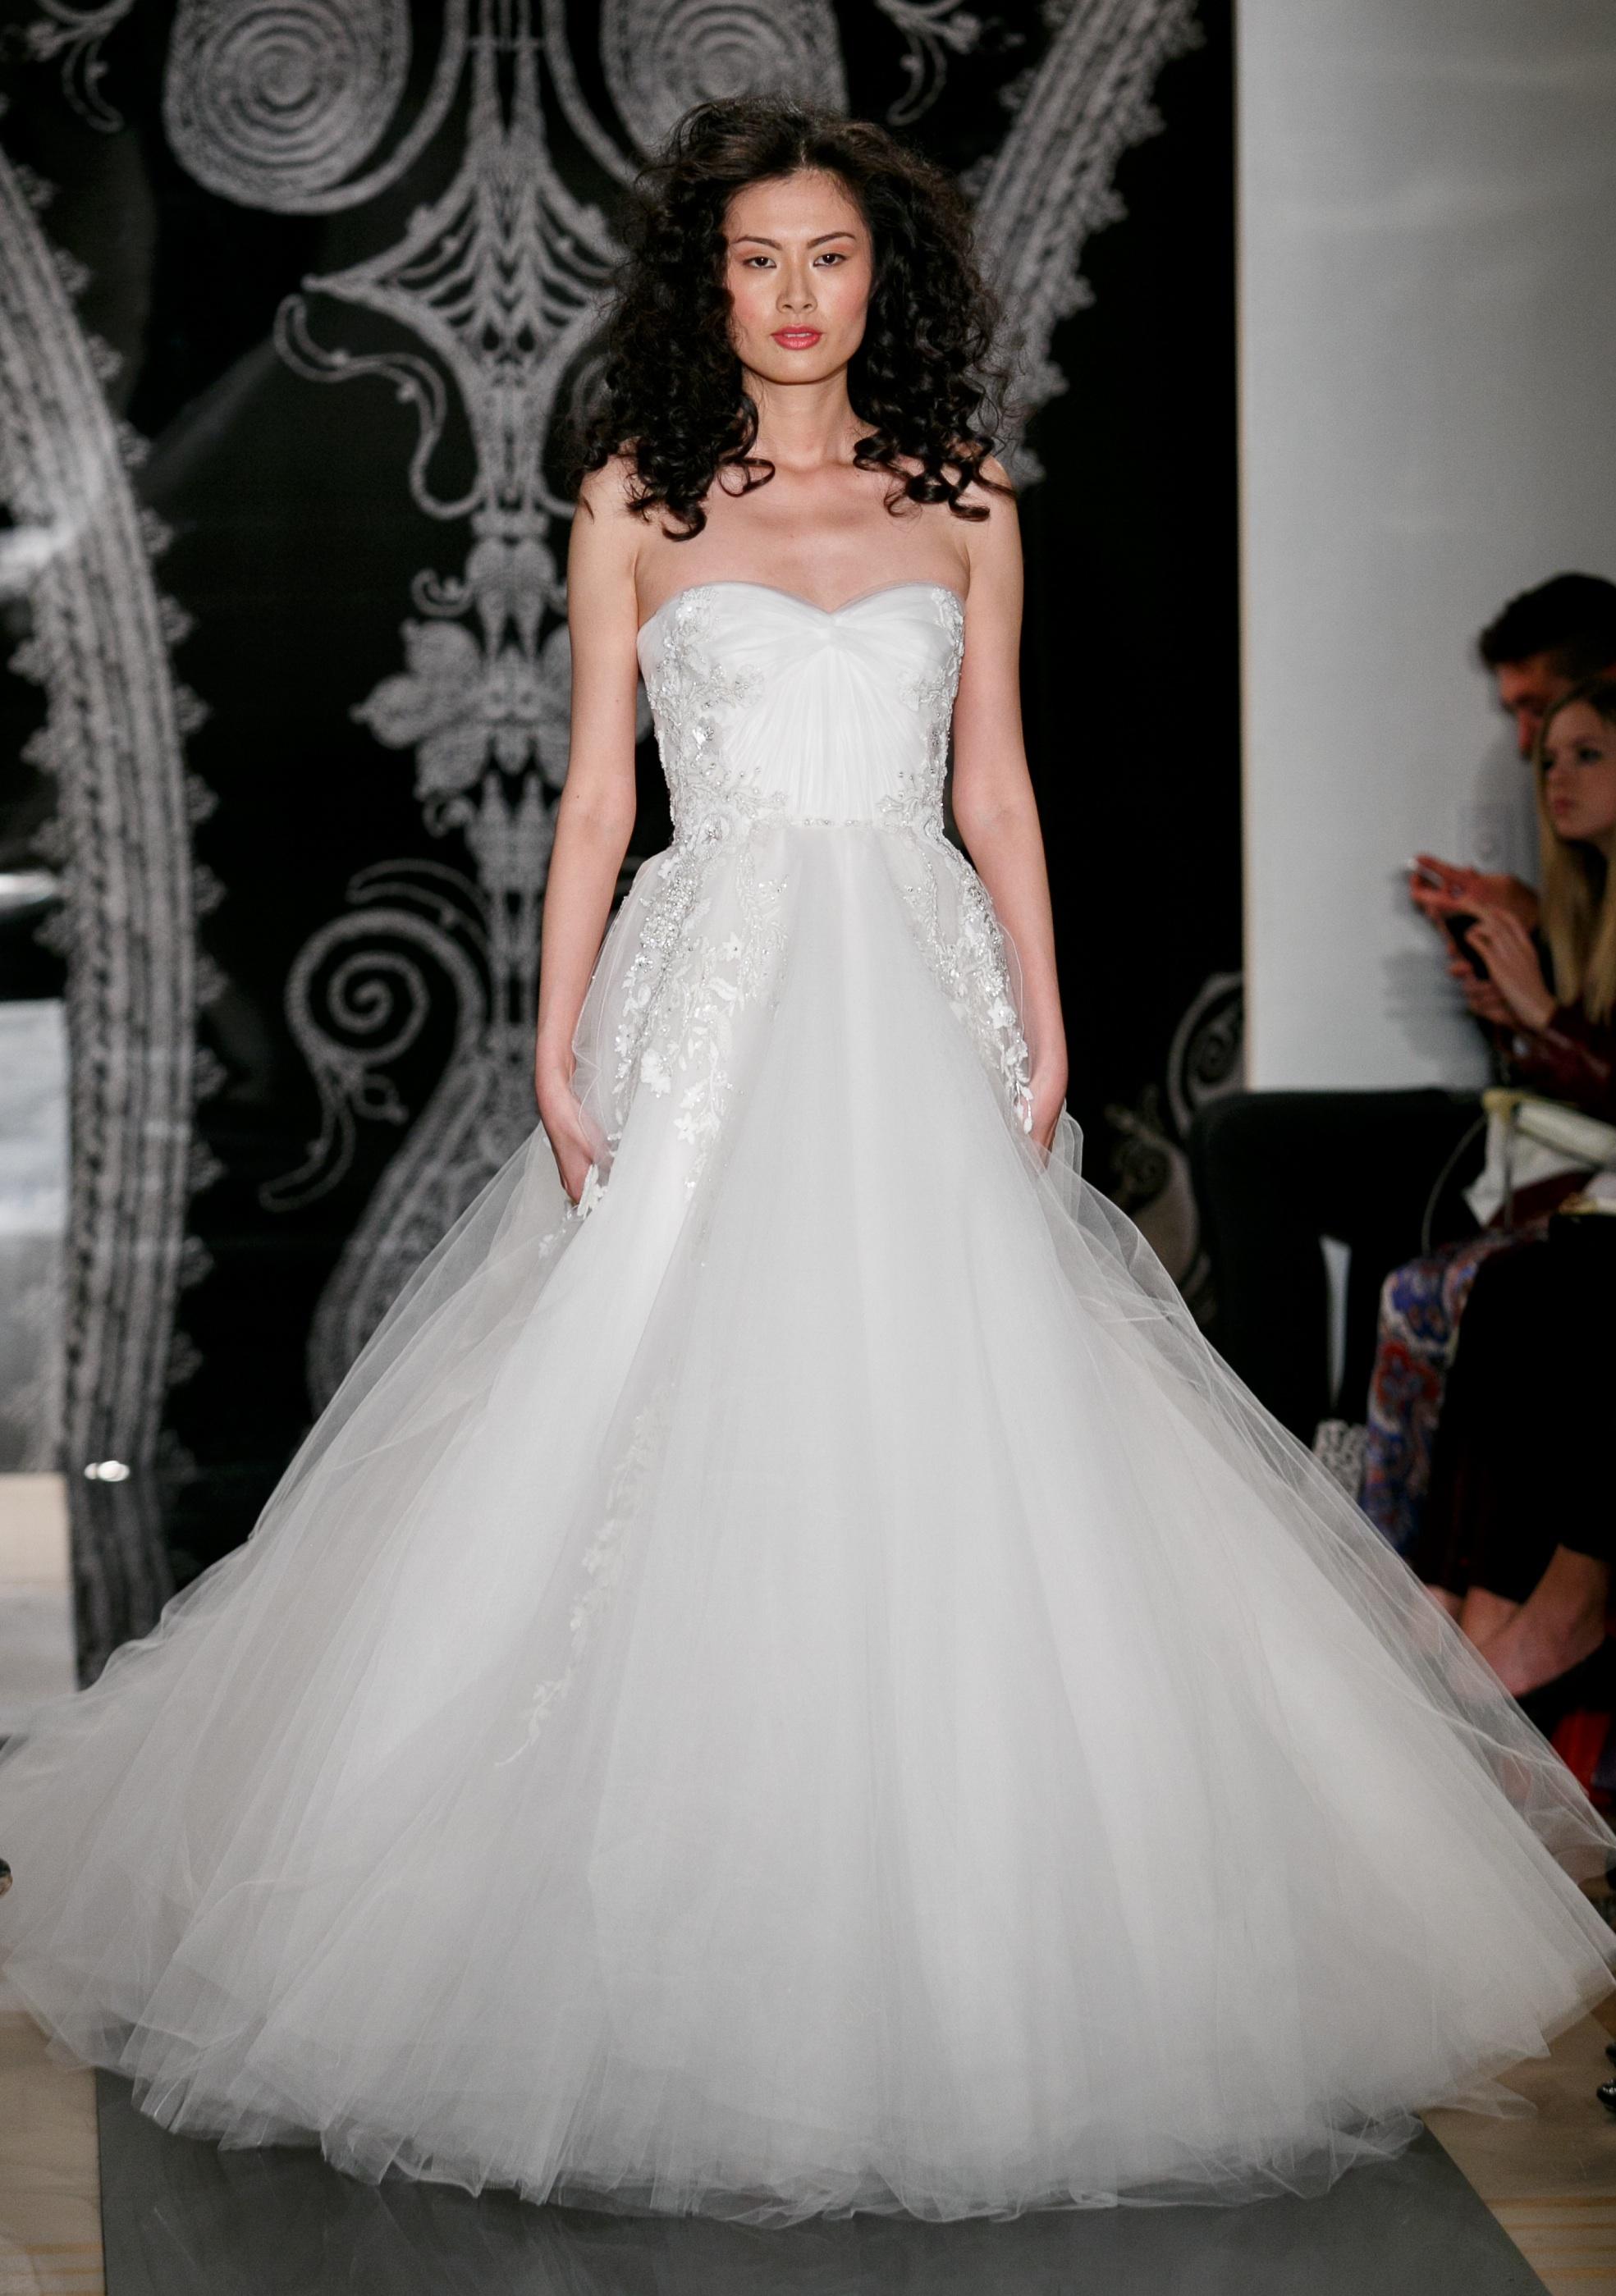 Reem Acra Wedding Gown 029 - Reem Acra Wedding Gown